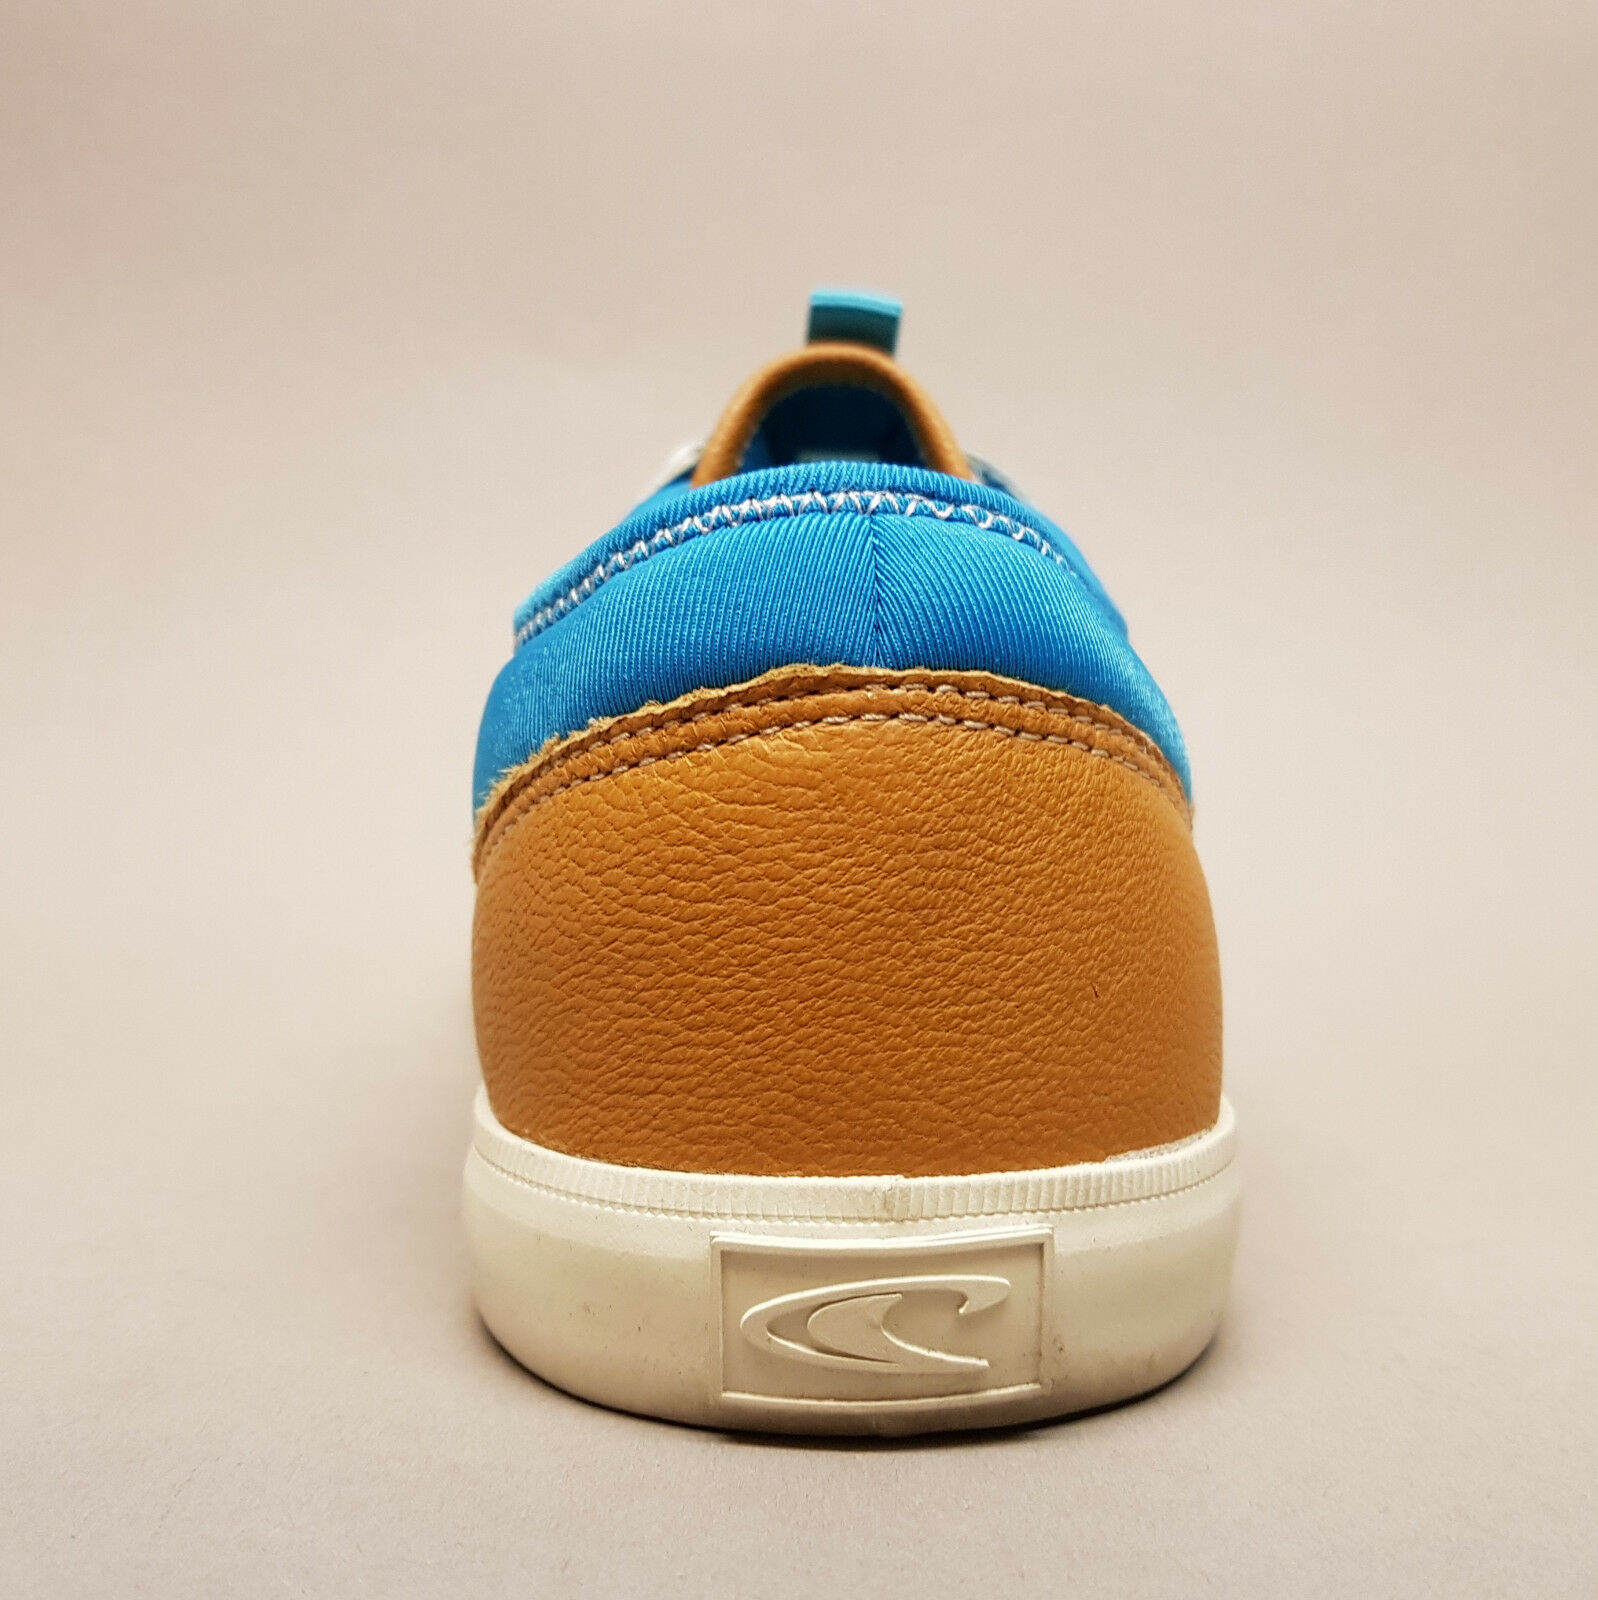 O'Neill blau Mutant Petrol Suede 59.1098.01 S35 Sneaker Halbschuhe blau O'Neill 39 40 41 43 51664a